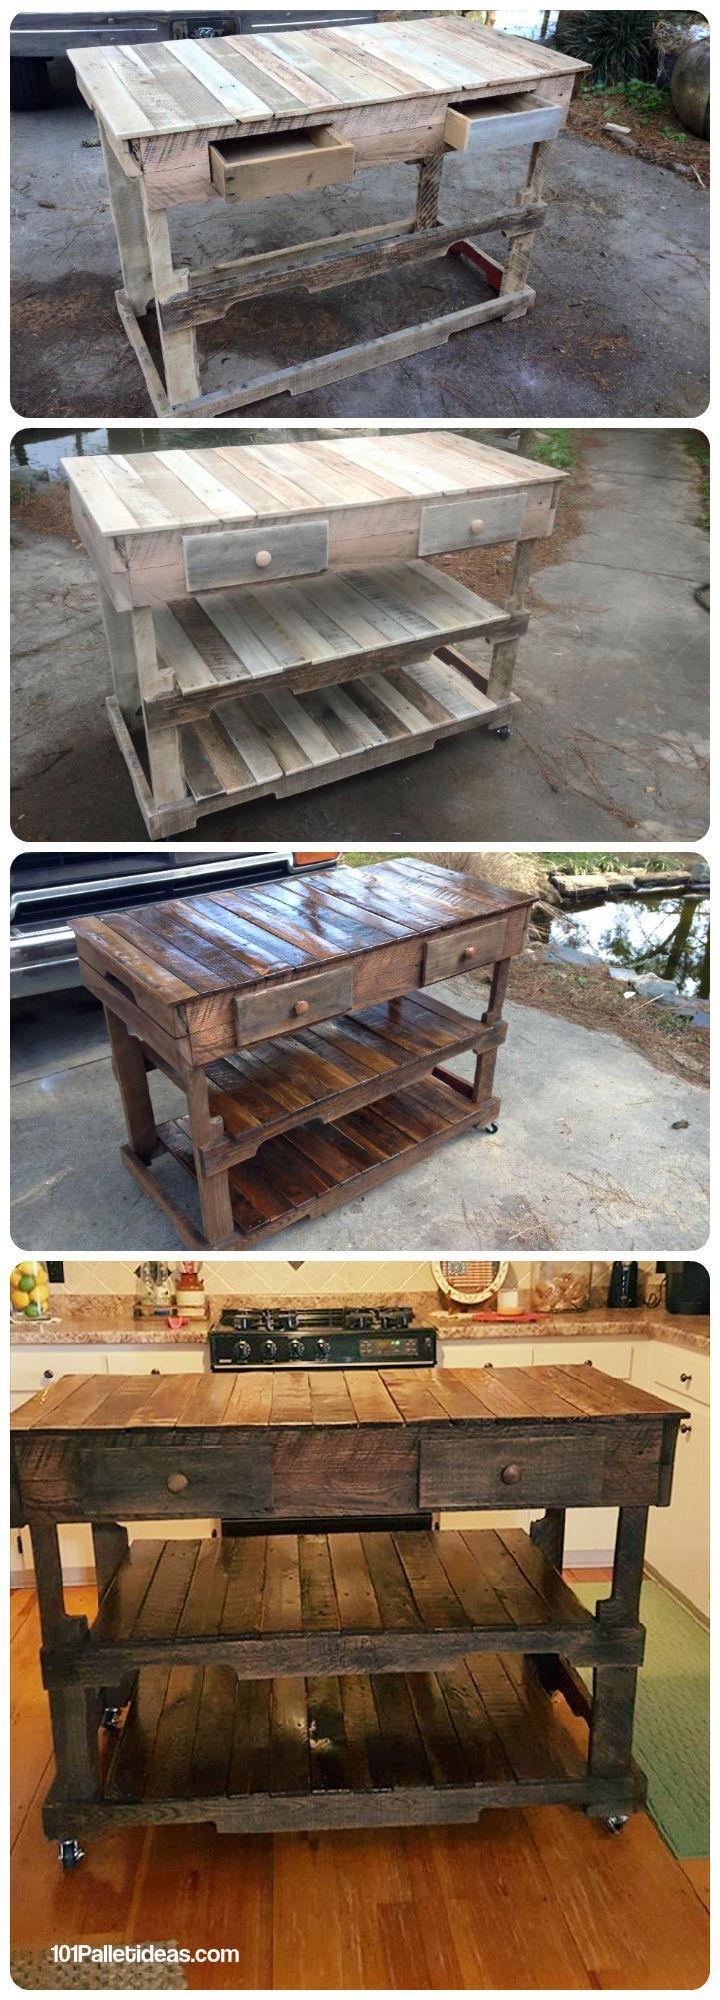 Pallets wood made kitchen island 101 pallet ideas for Pallet kitchen island plans